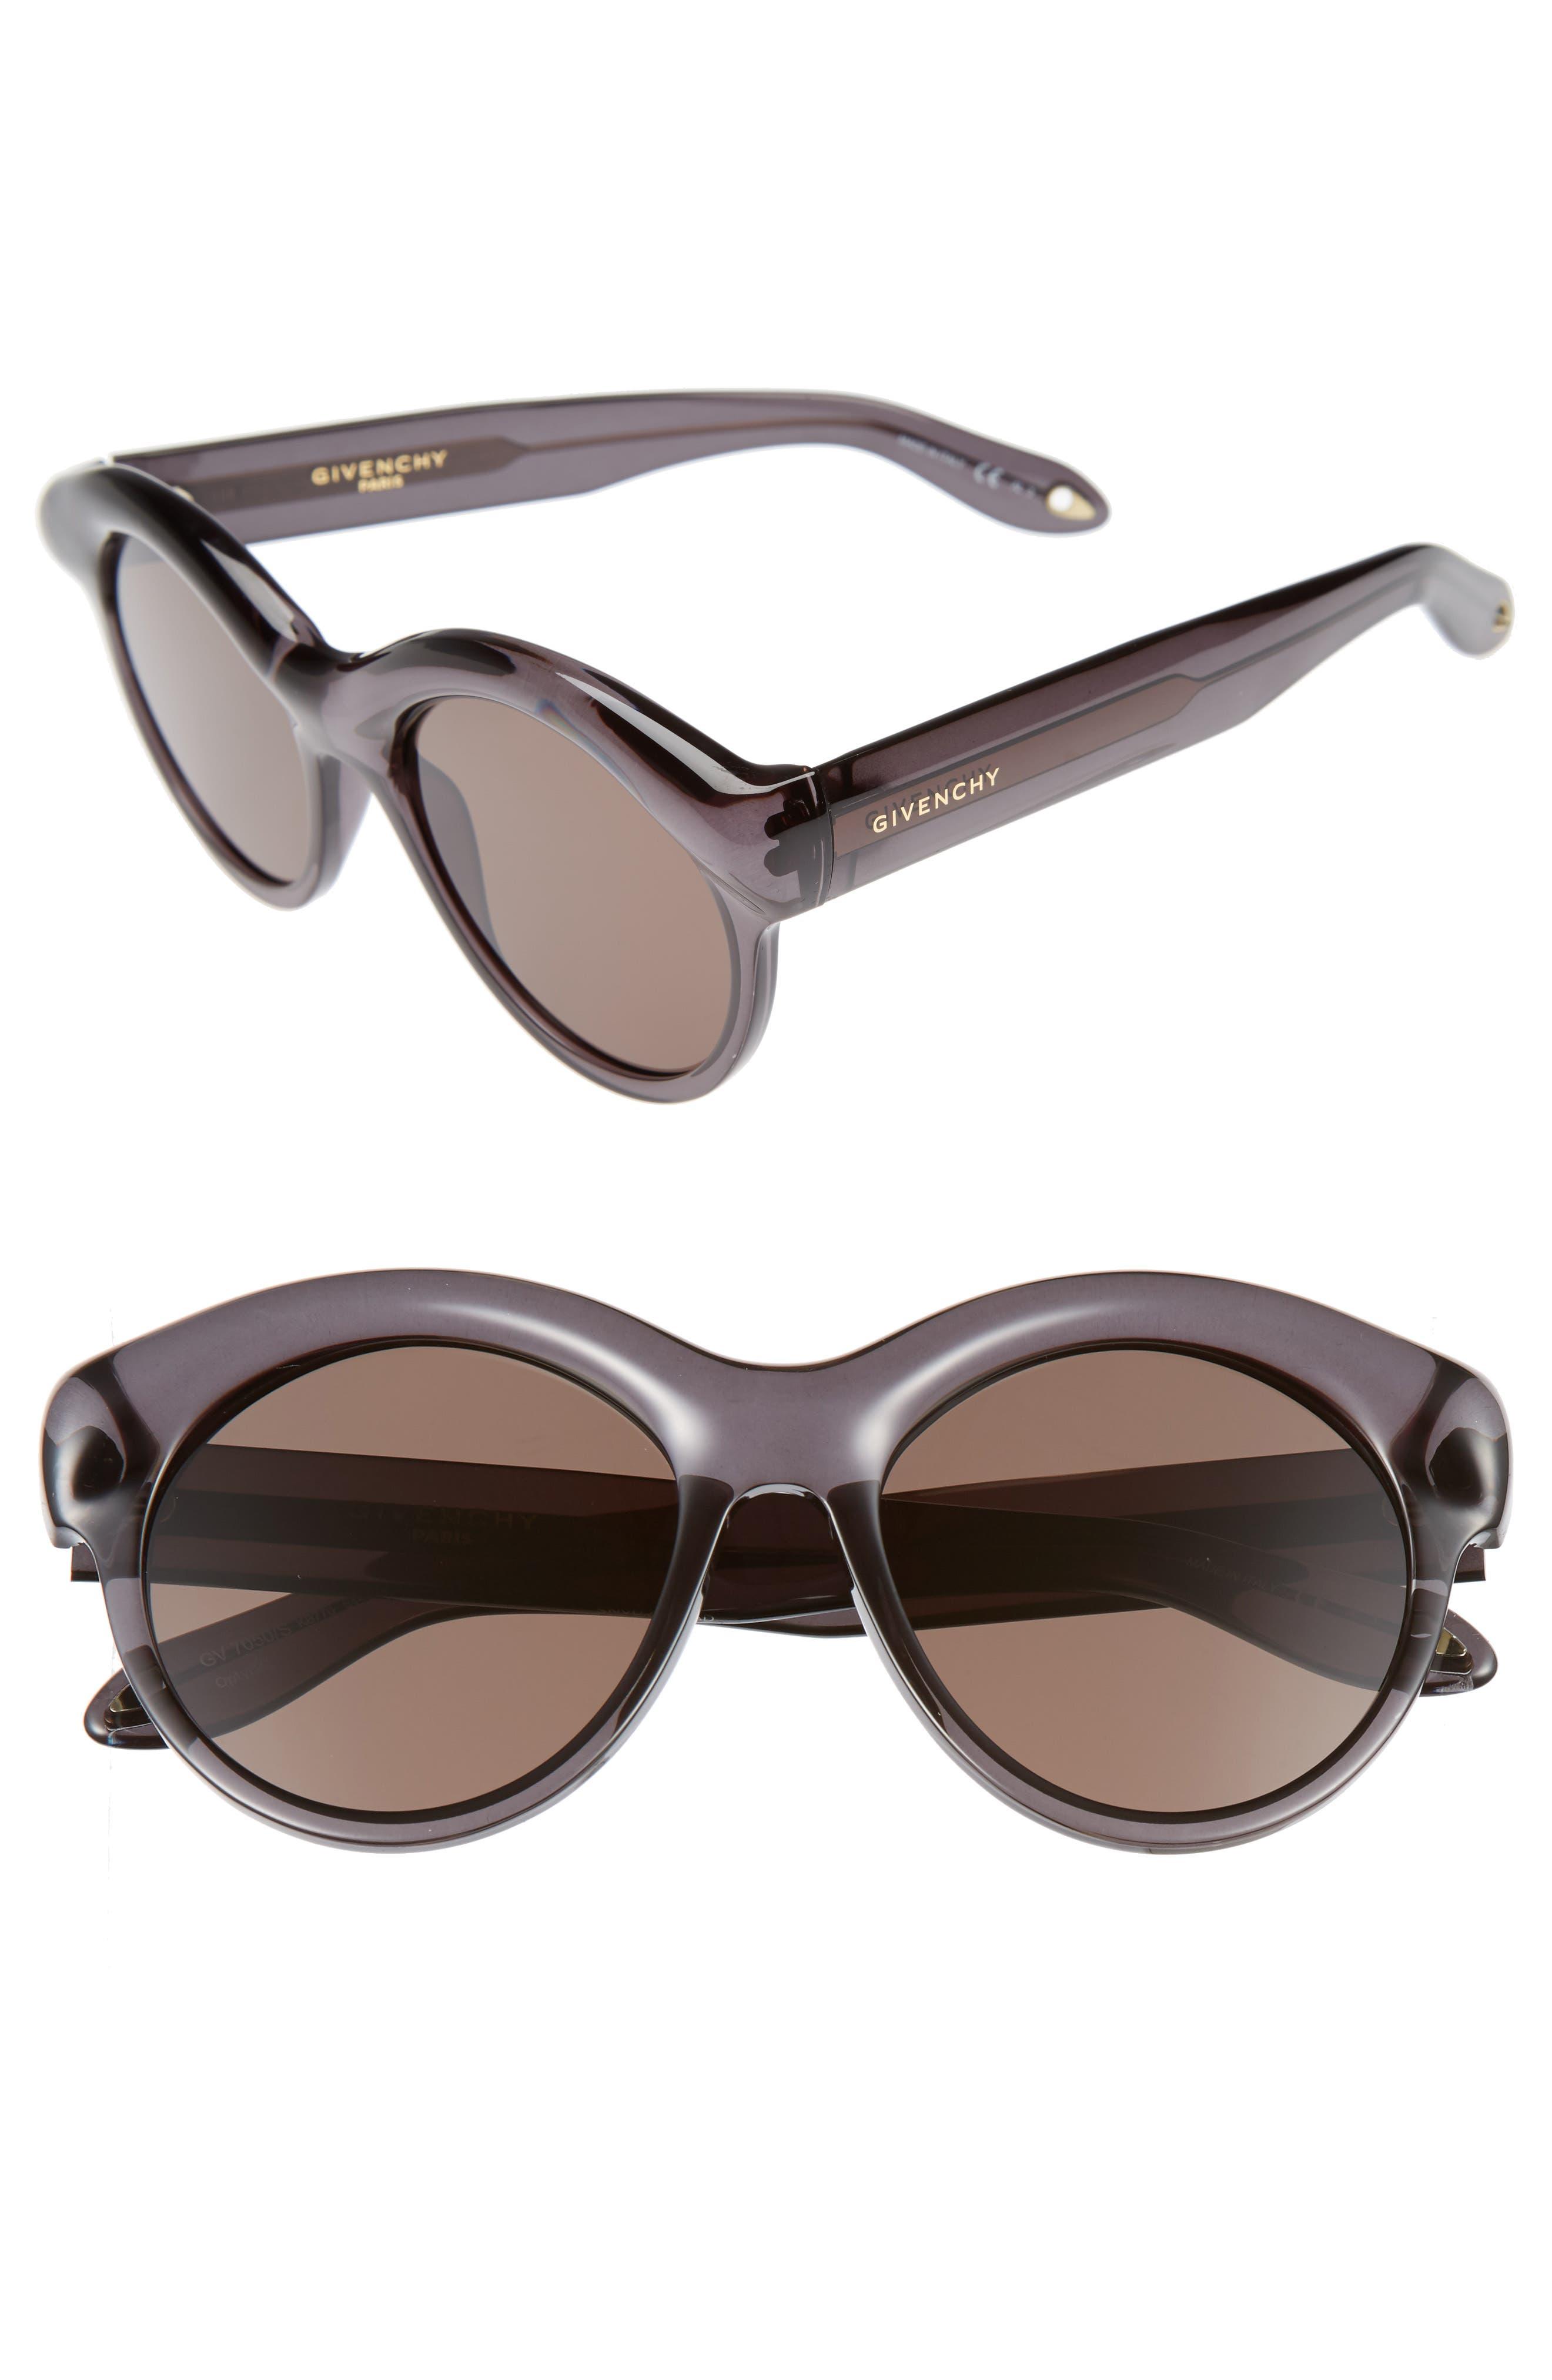 54mm Sunglasses,                             Main thumbnail 1, color,                             020